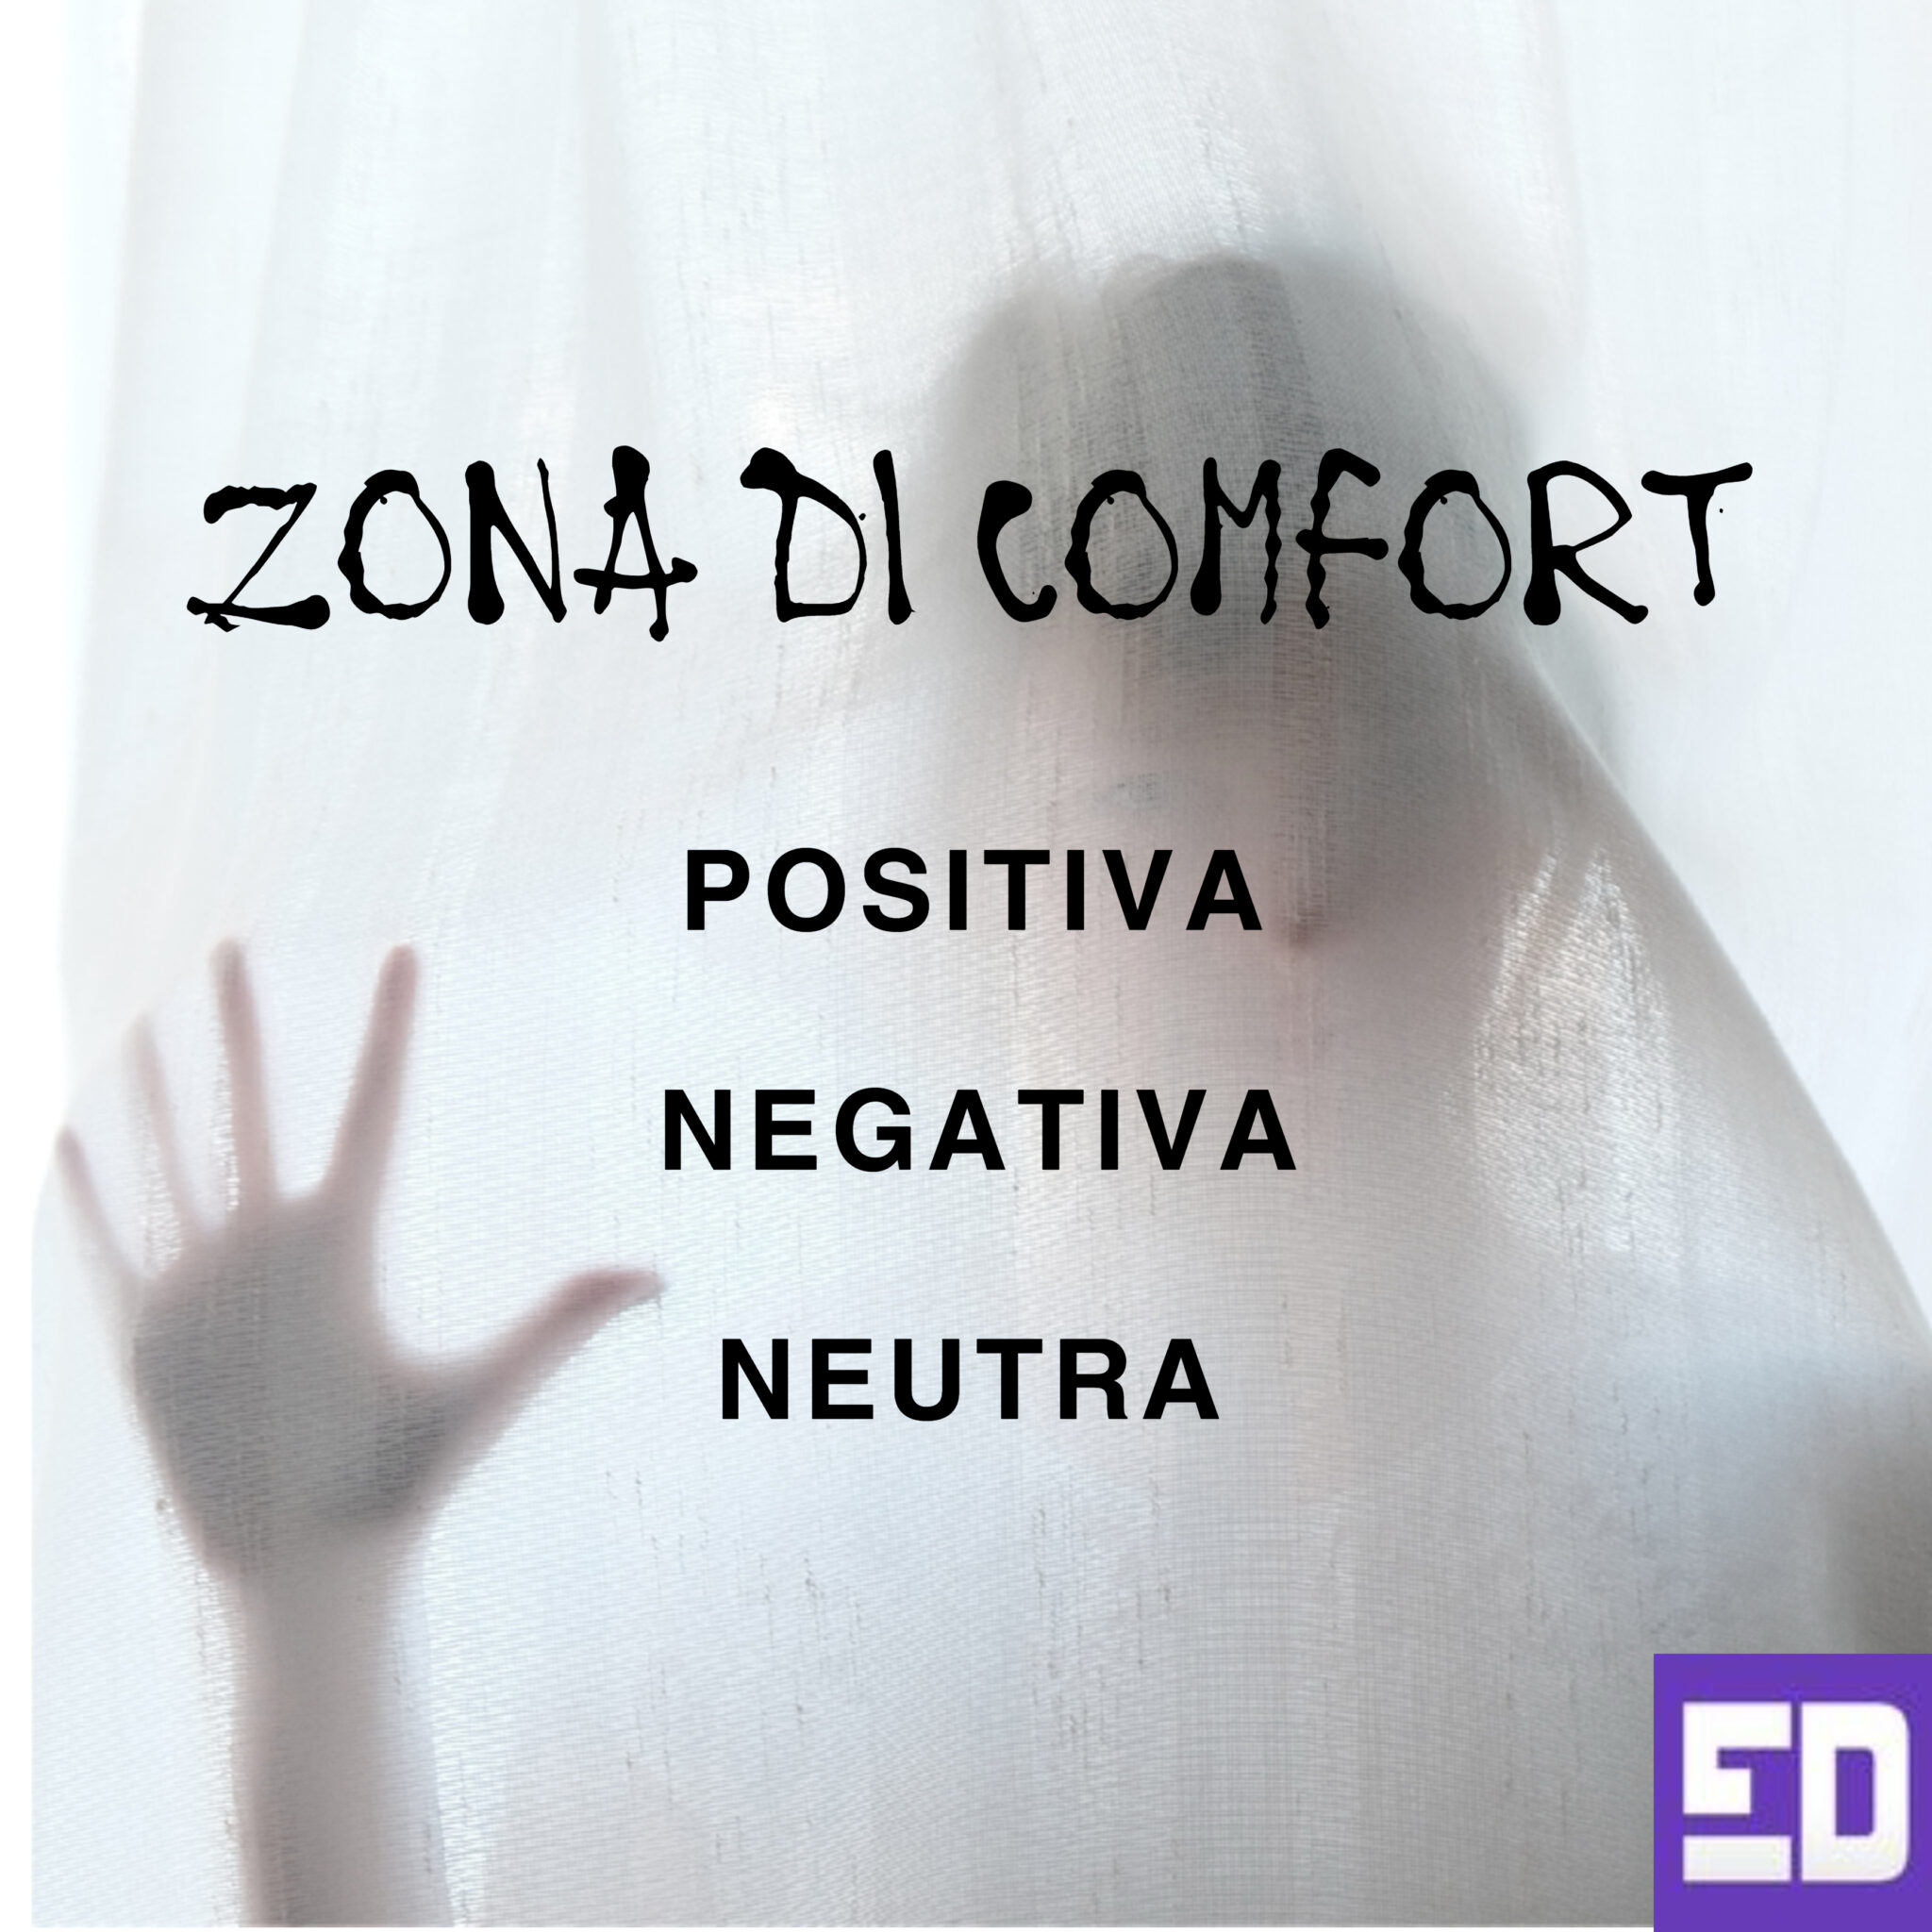 zona di comfort 3 tipi